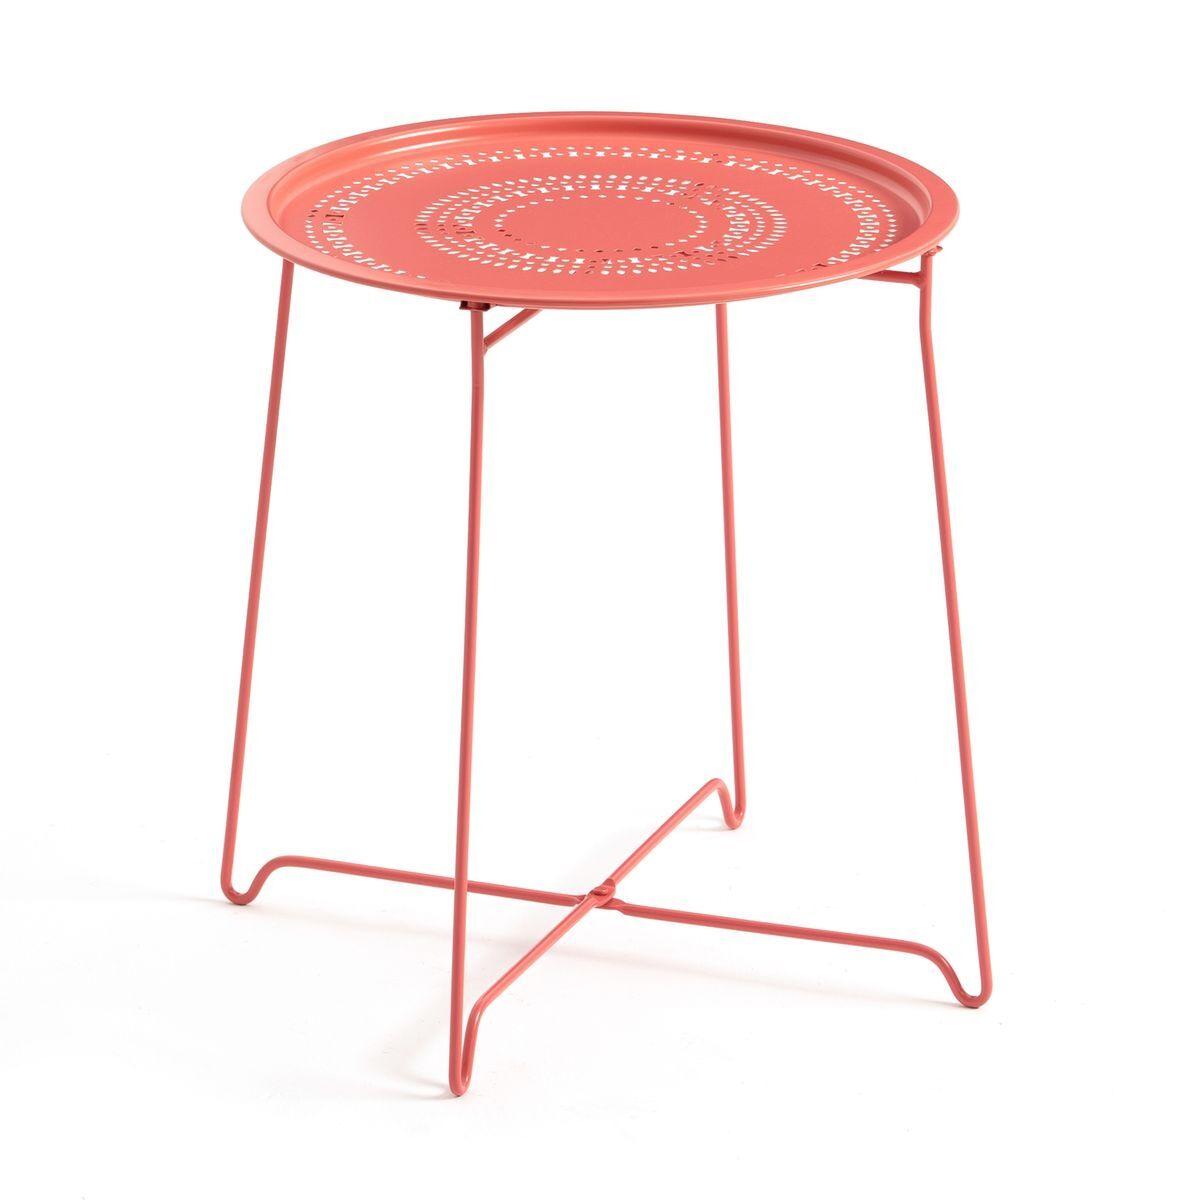 La Redoute Table basse Lisette, pliante, en métal - LA REDOUTE INTERIEURS